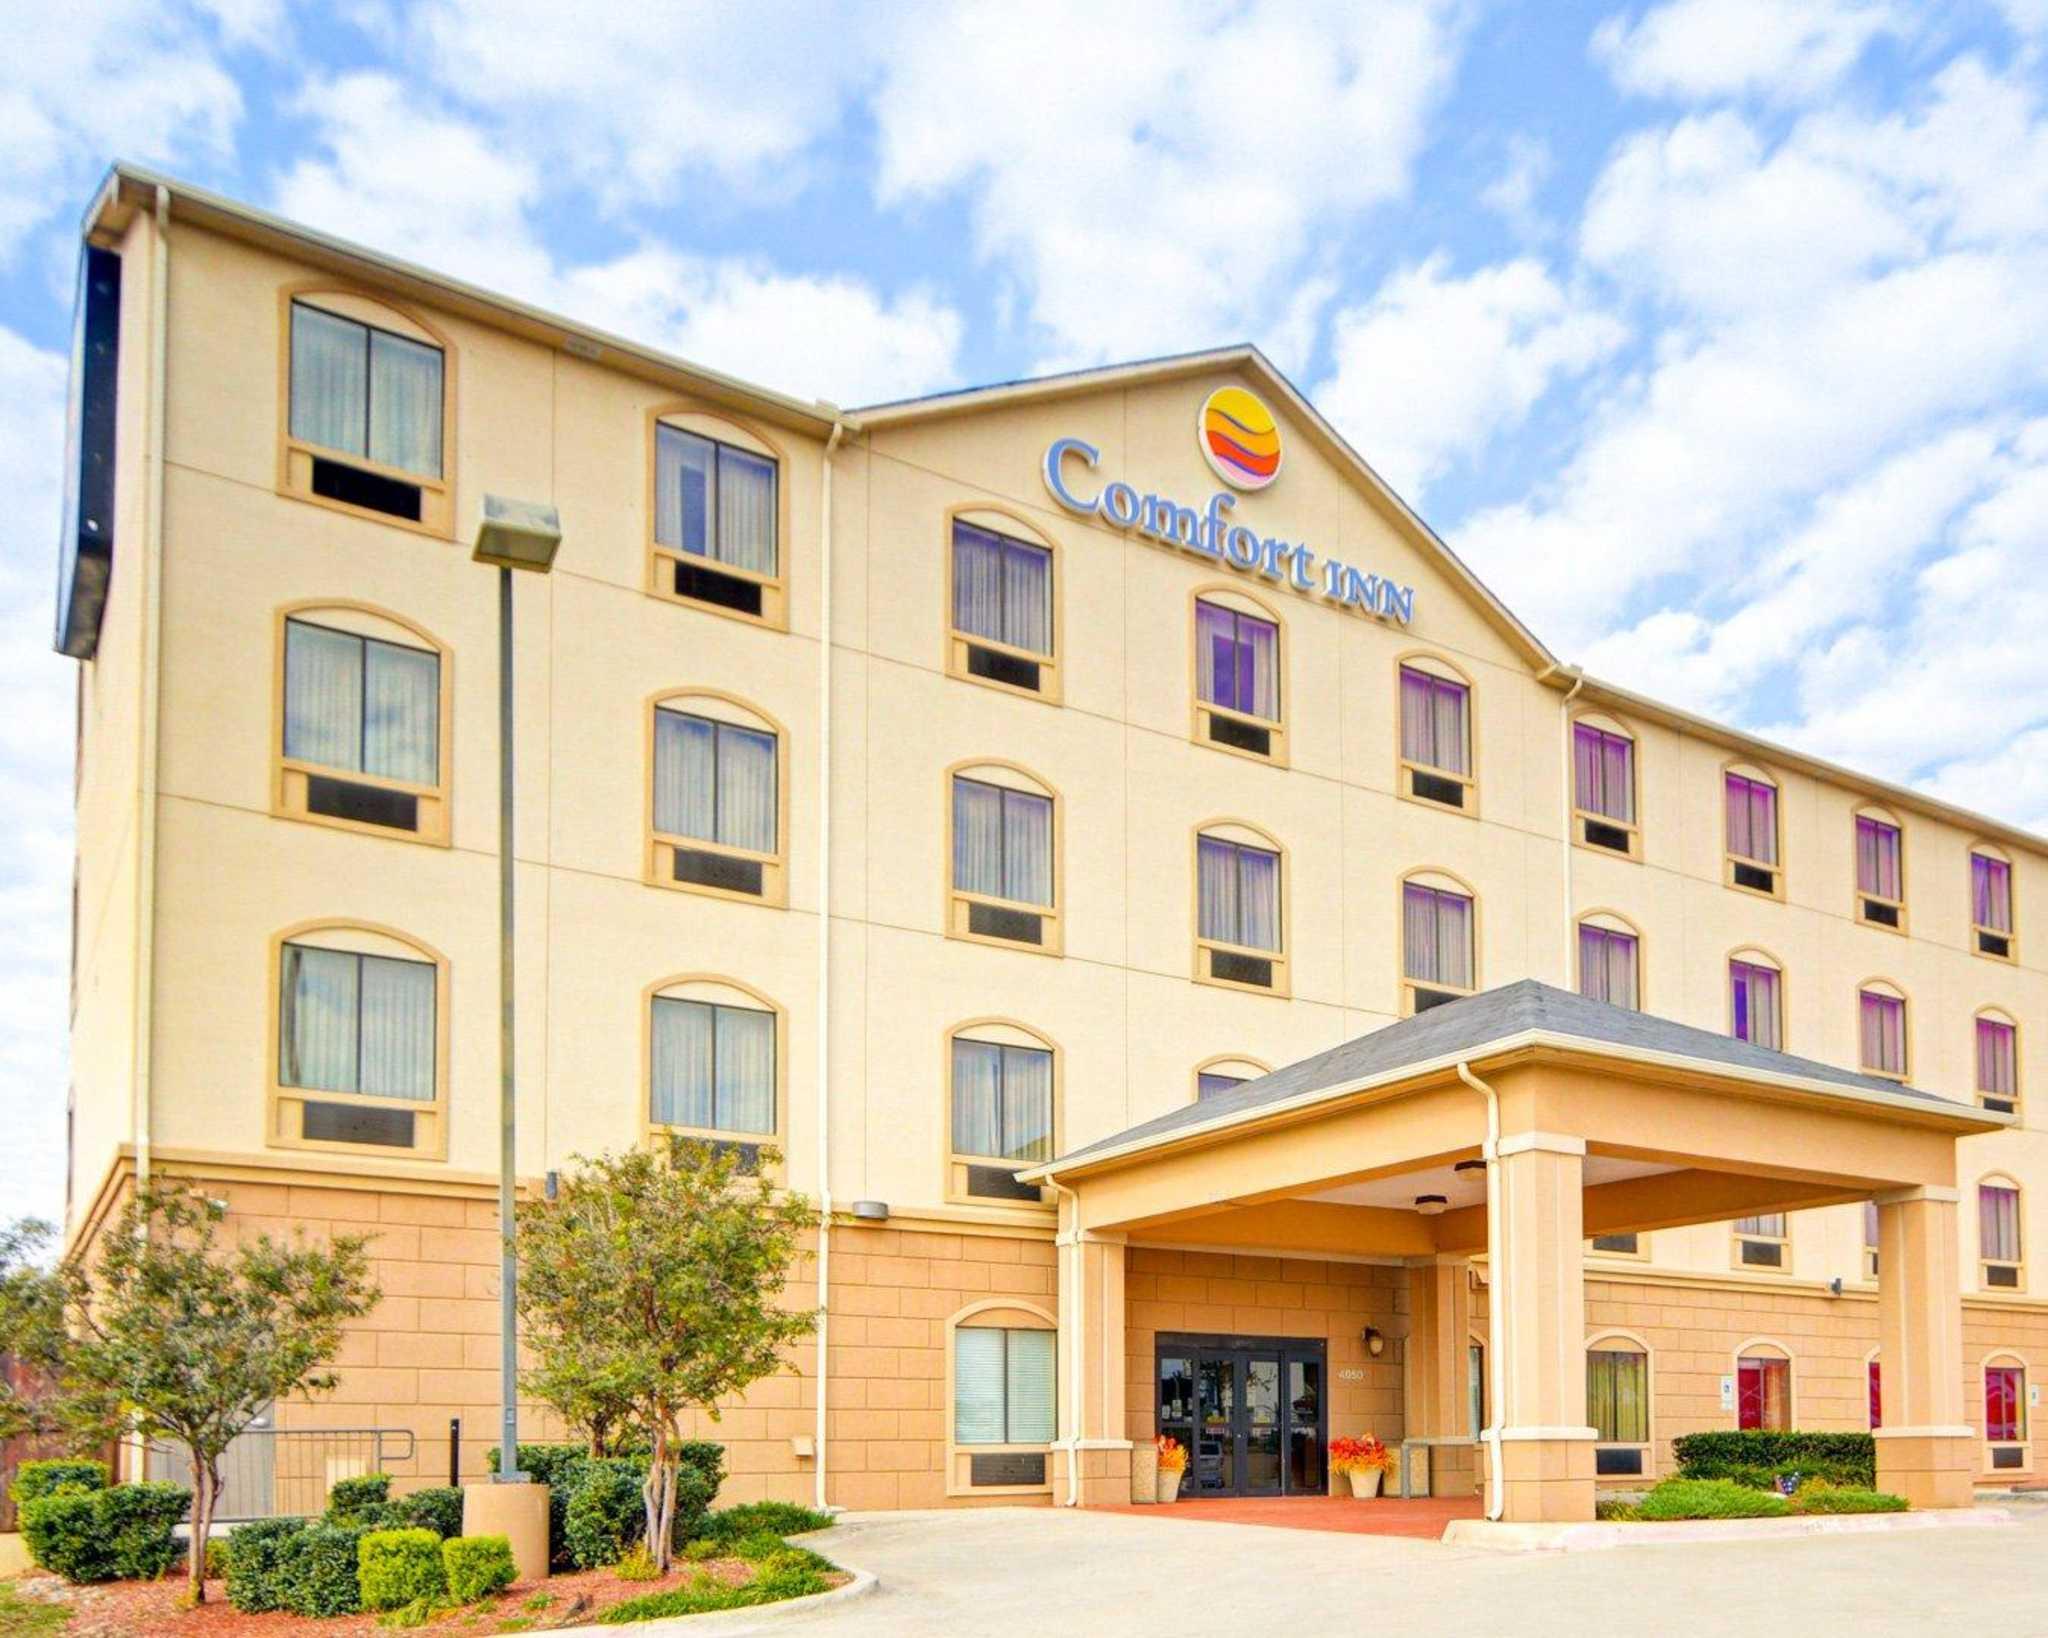 Comfort Inn Near UNT - Denton, TX 76207 - (940)320-5150 | ShowMeLocal.com